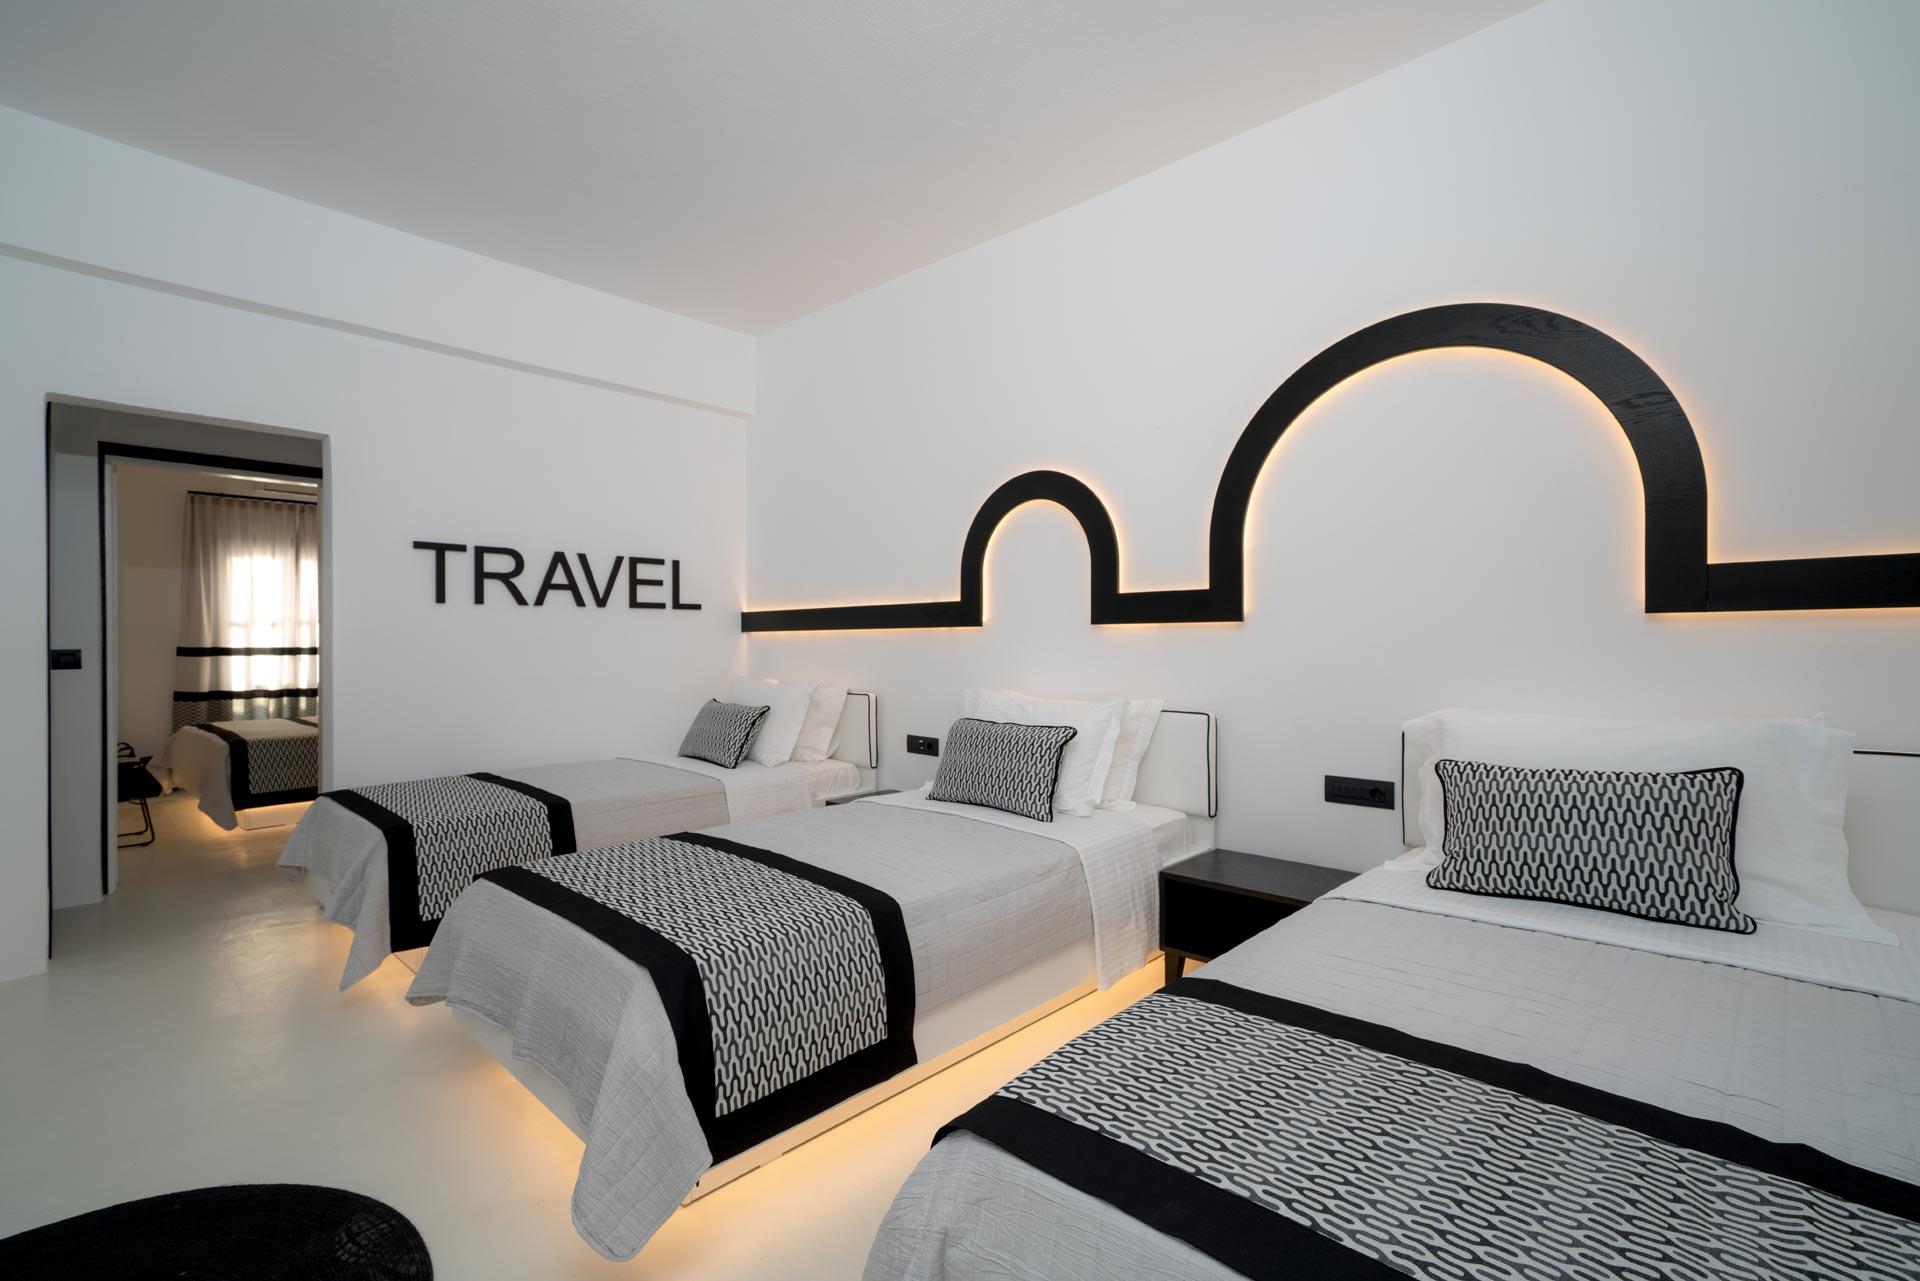 divelia-hotel-family-travel-room